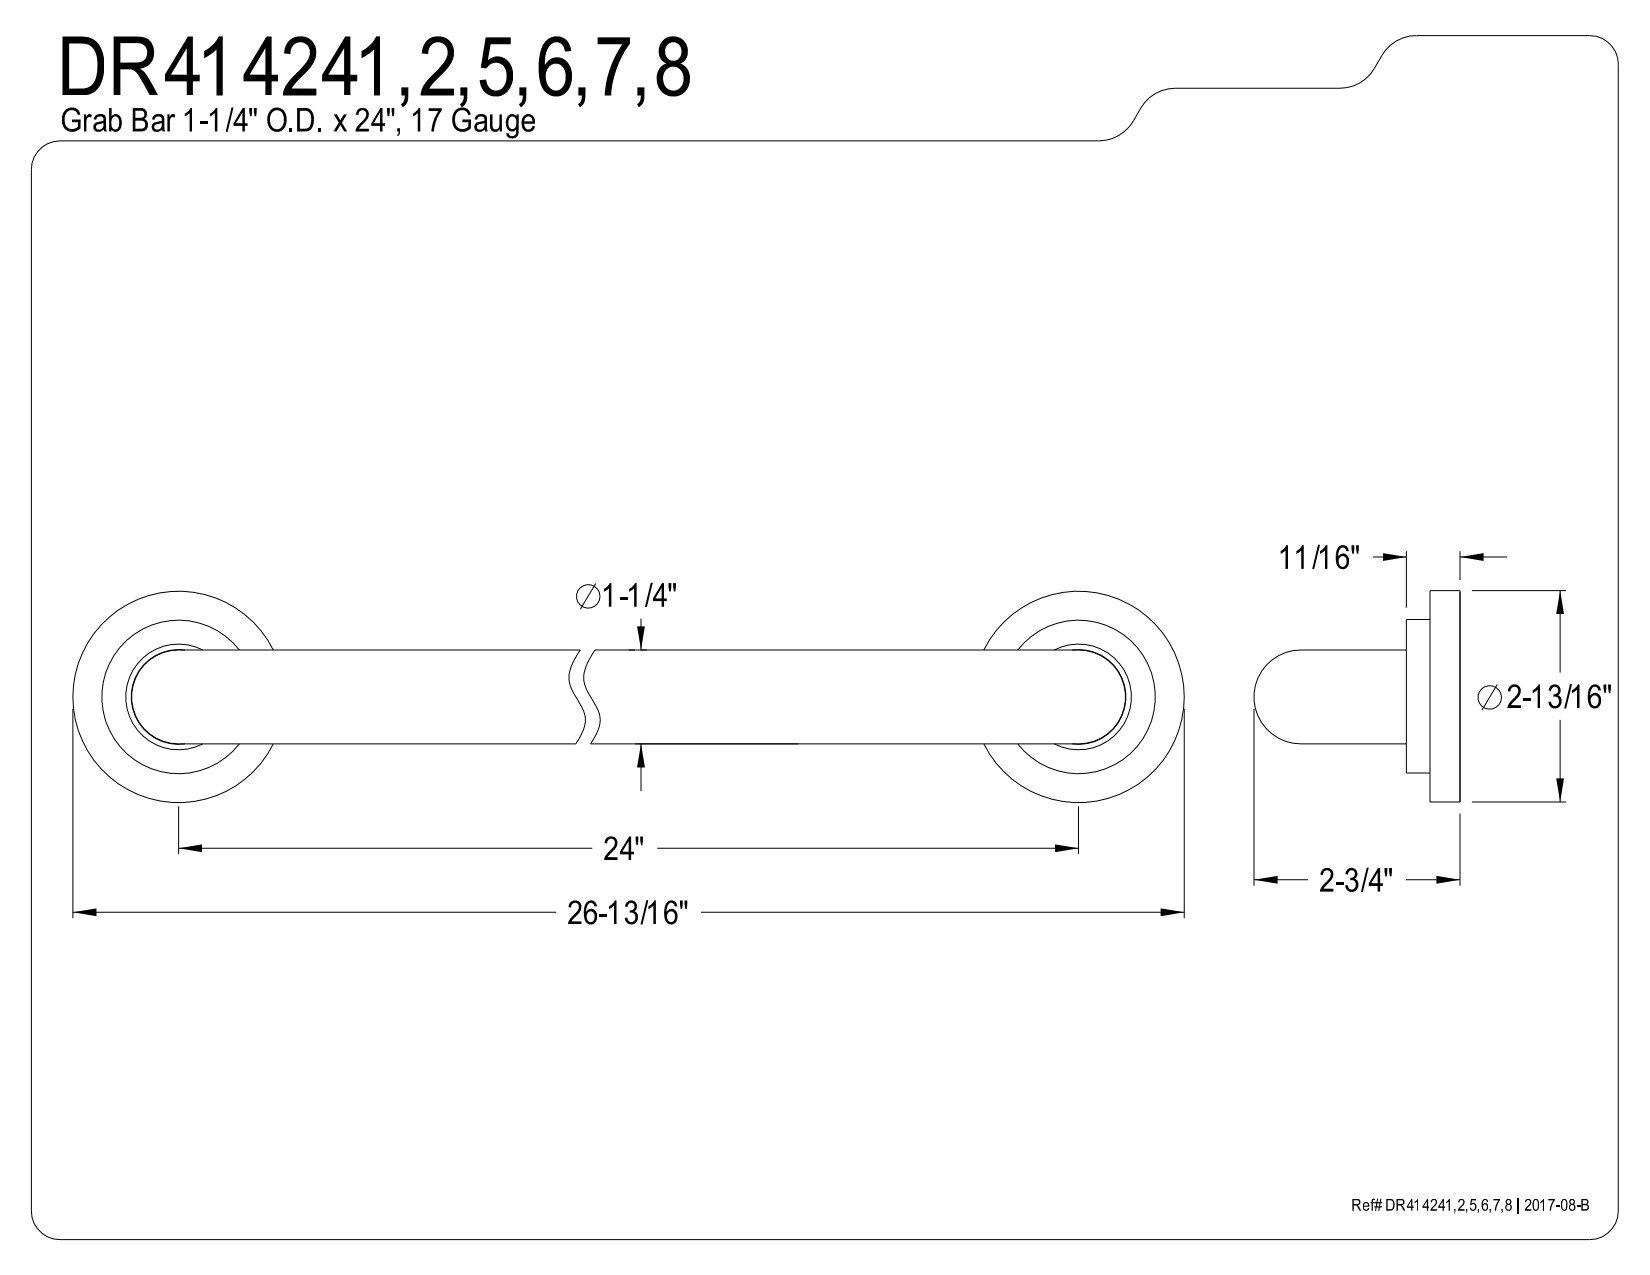 Kingston Brass DR414245 Designer Trimscape Manhattan Decor 24-Inch Grab Bar with 1.25-Inch Outer Diameter, Oil Rubbed Bronze